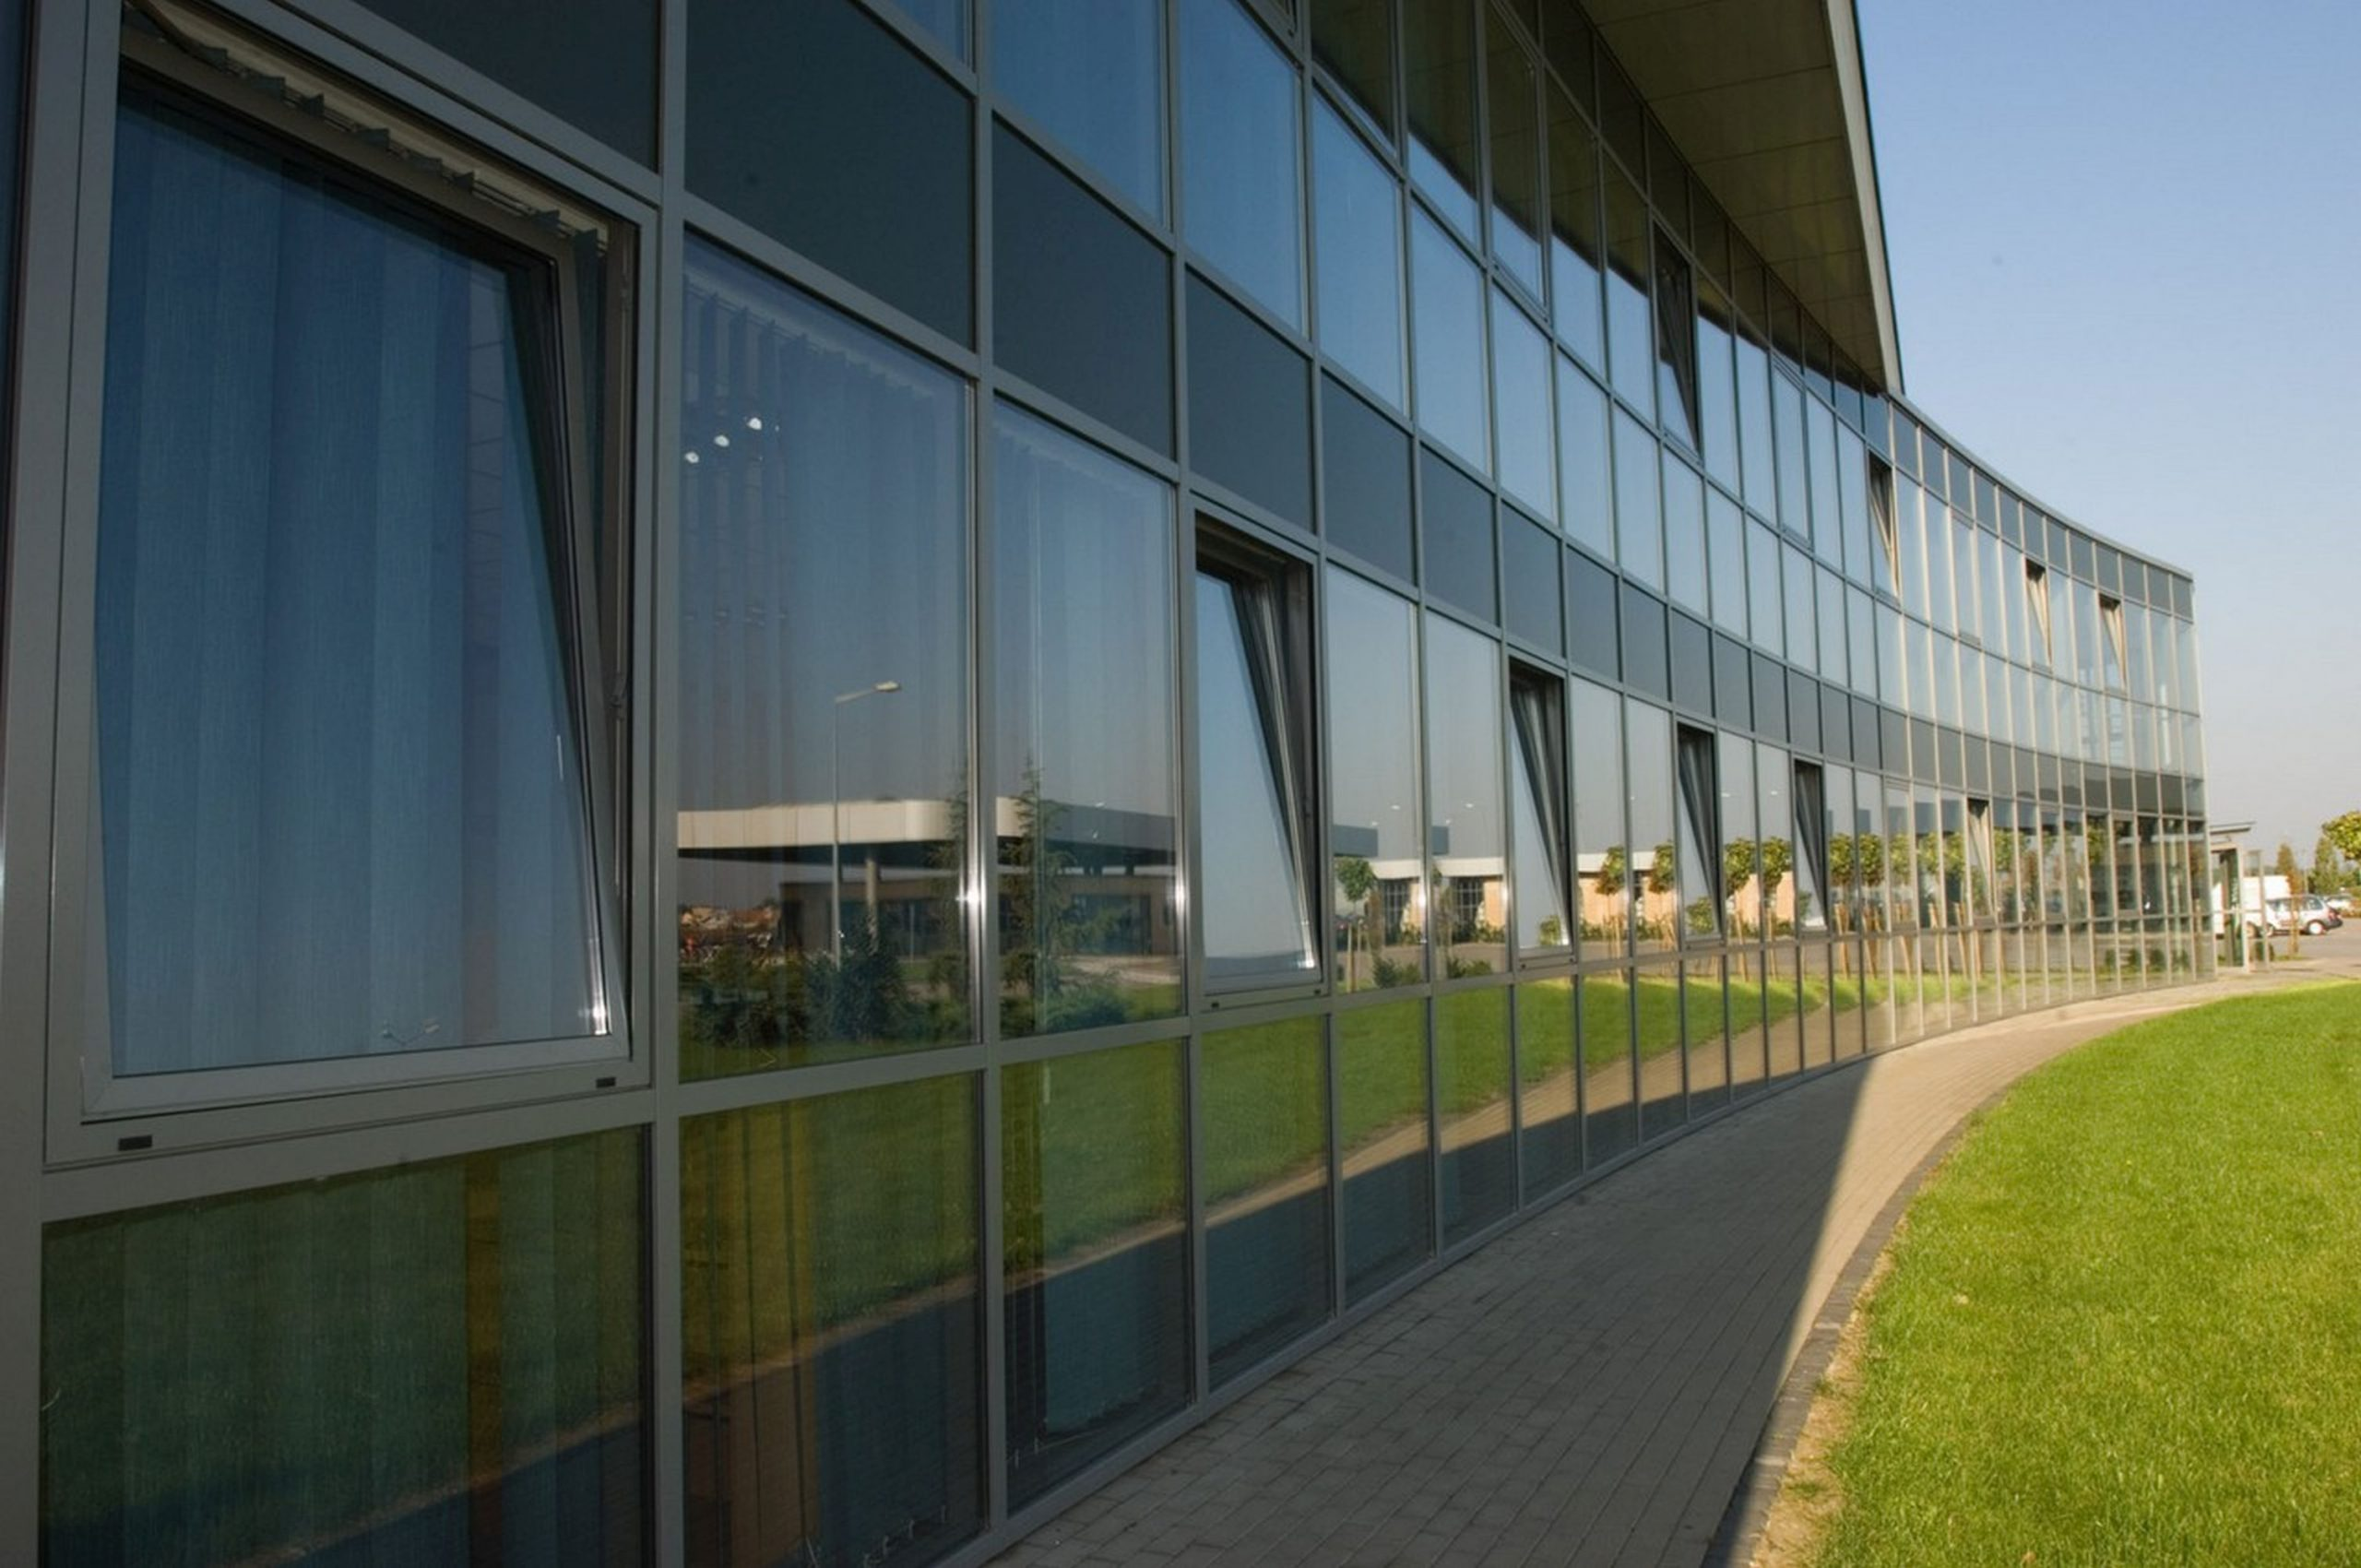 ac-kern-schüco-aluprofhs-mb-50tti-türen-fenster-0001-scaled Fassaden